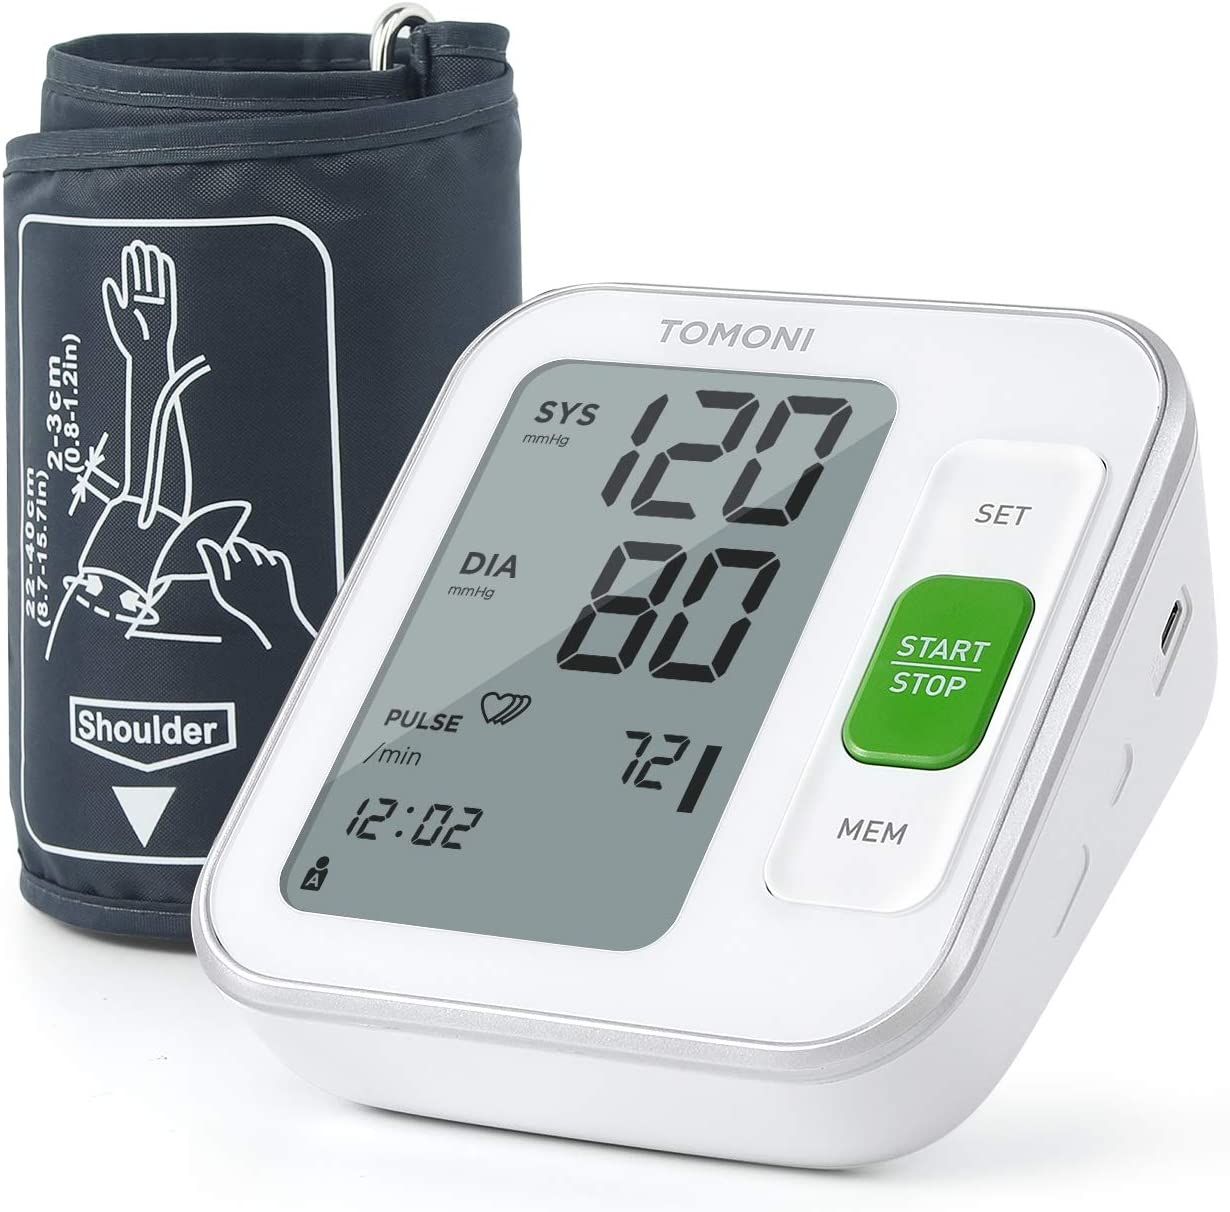 Blood Pressure Cuffs for Home Use - tomoni Blood Pressure Monitor Upper Arm Automatic Blood Pressure Machine, Adjustable Cuff 8.7